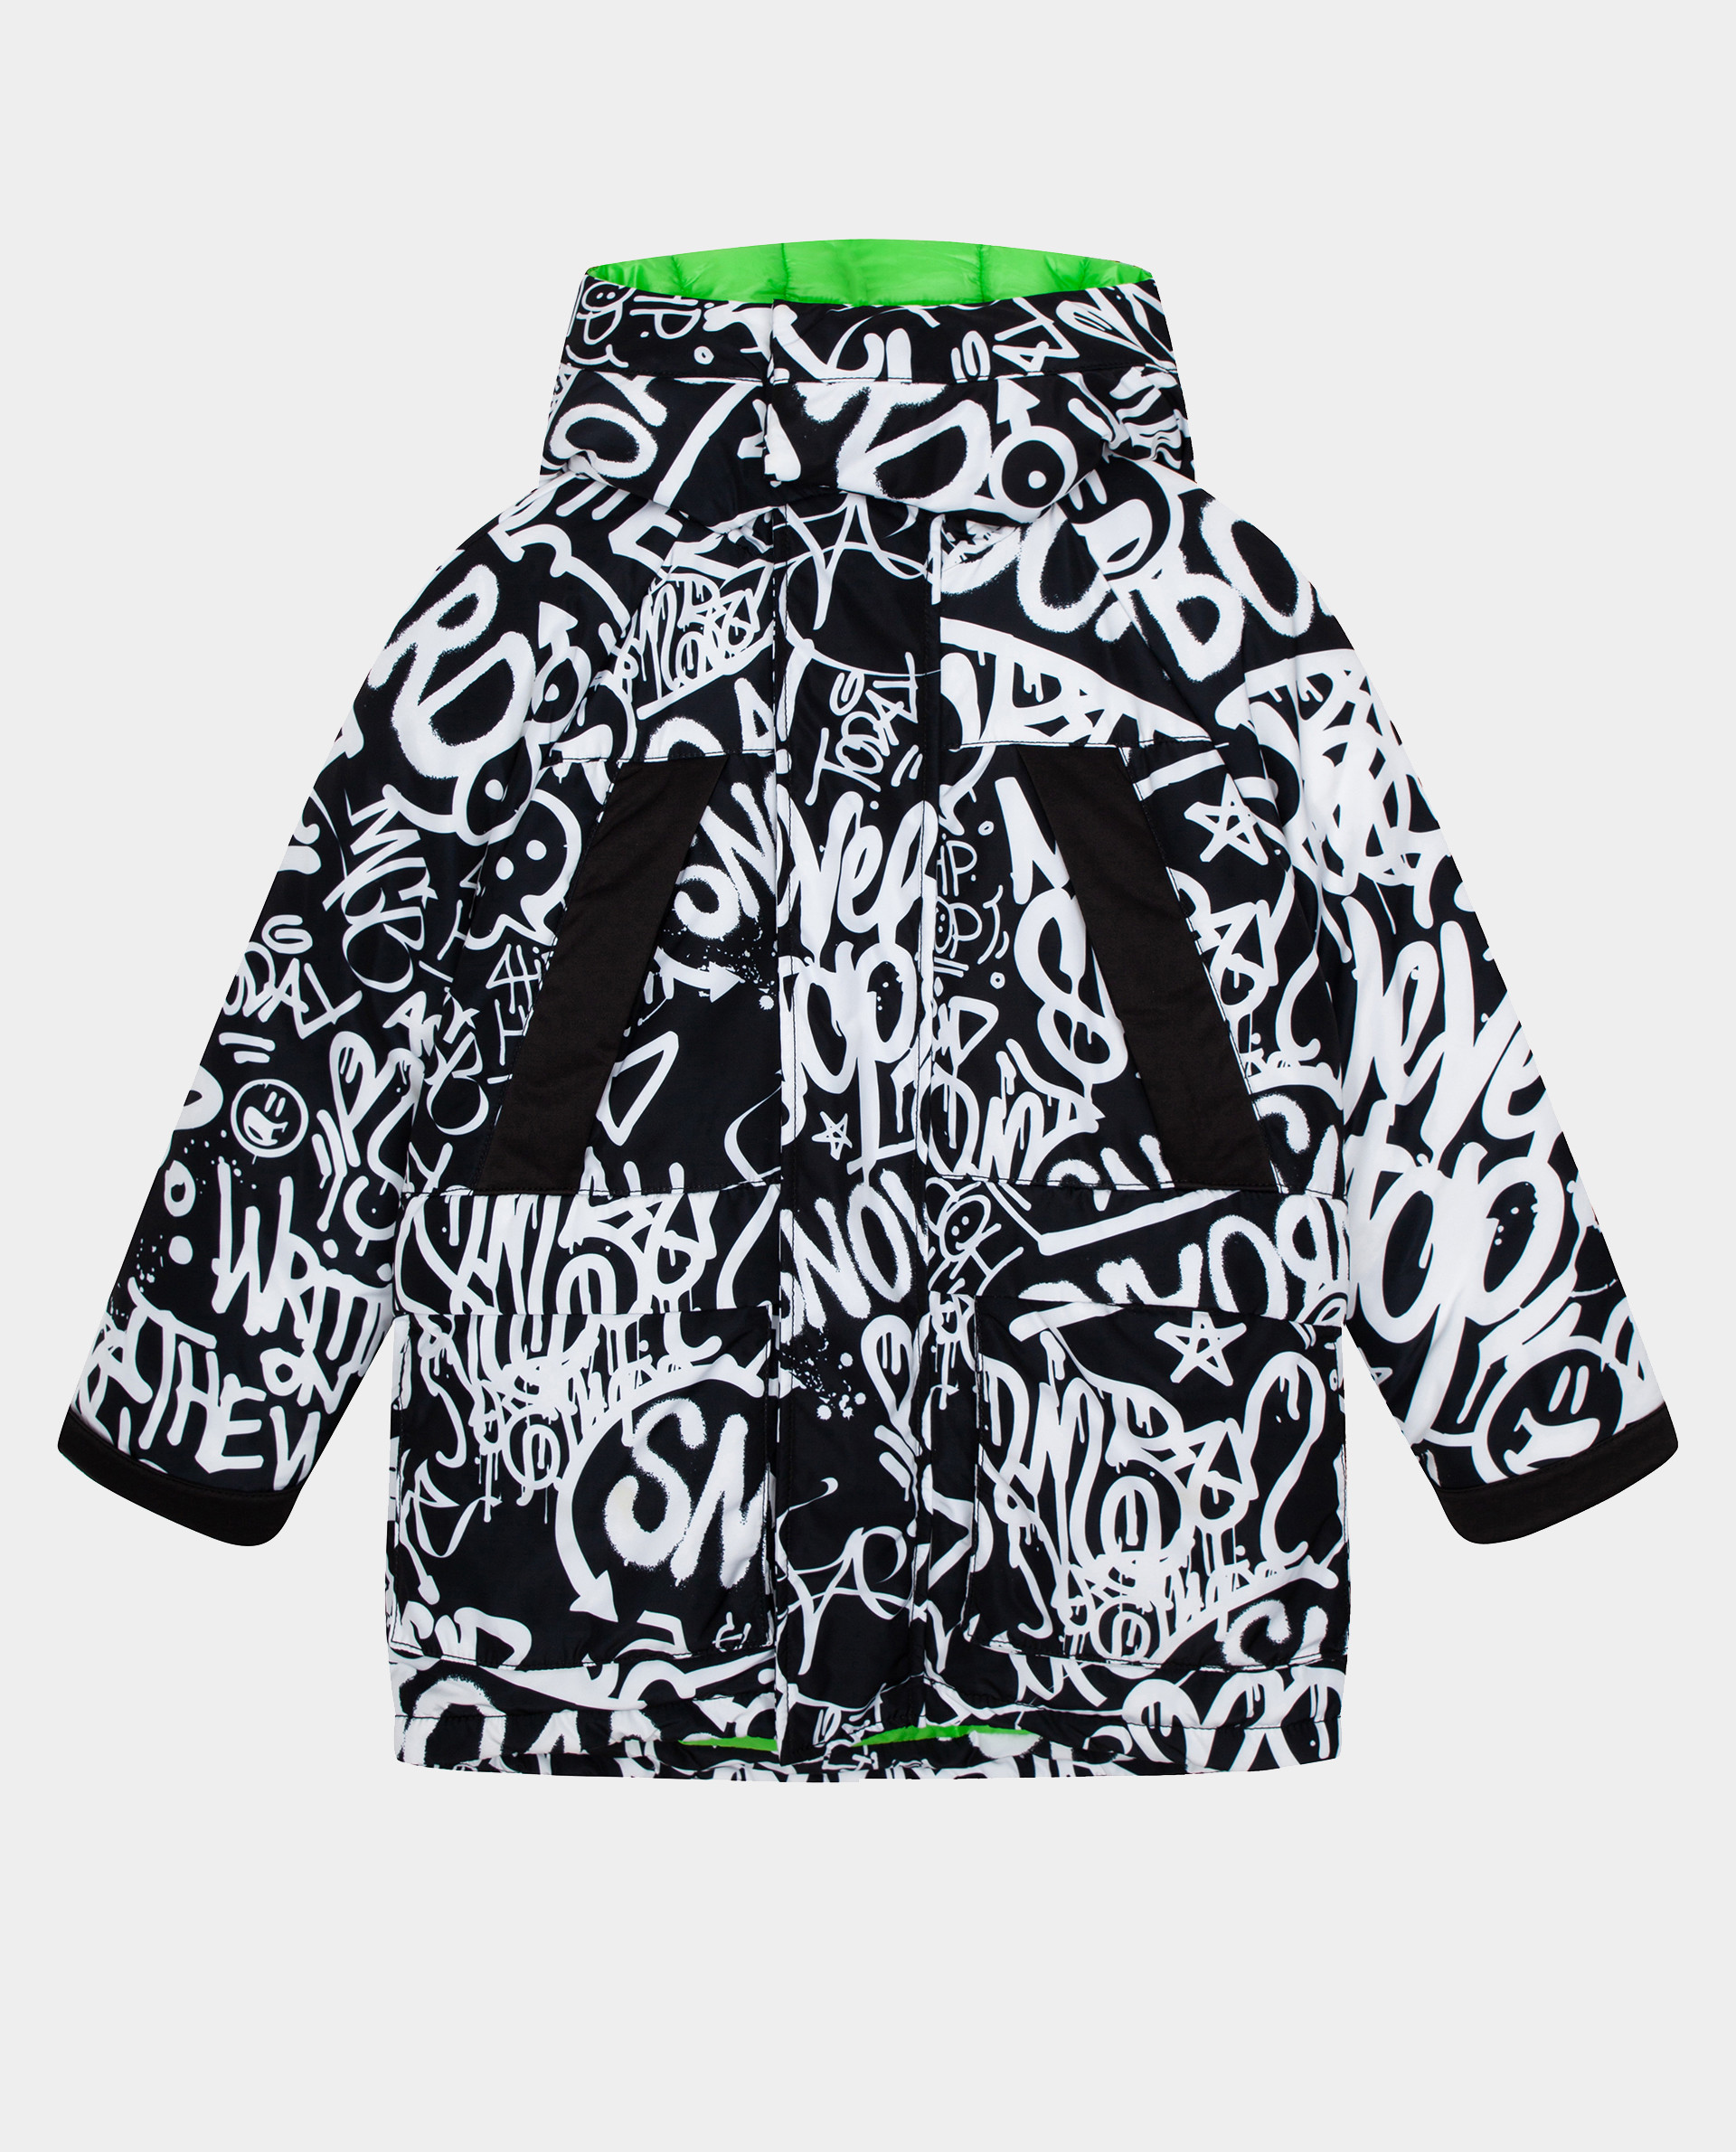 Купить Черная куртка зимняя Gulliver размер 152 22012BJC4104,